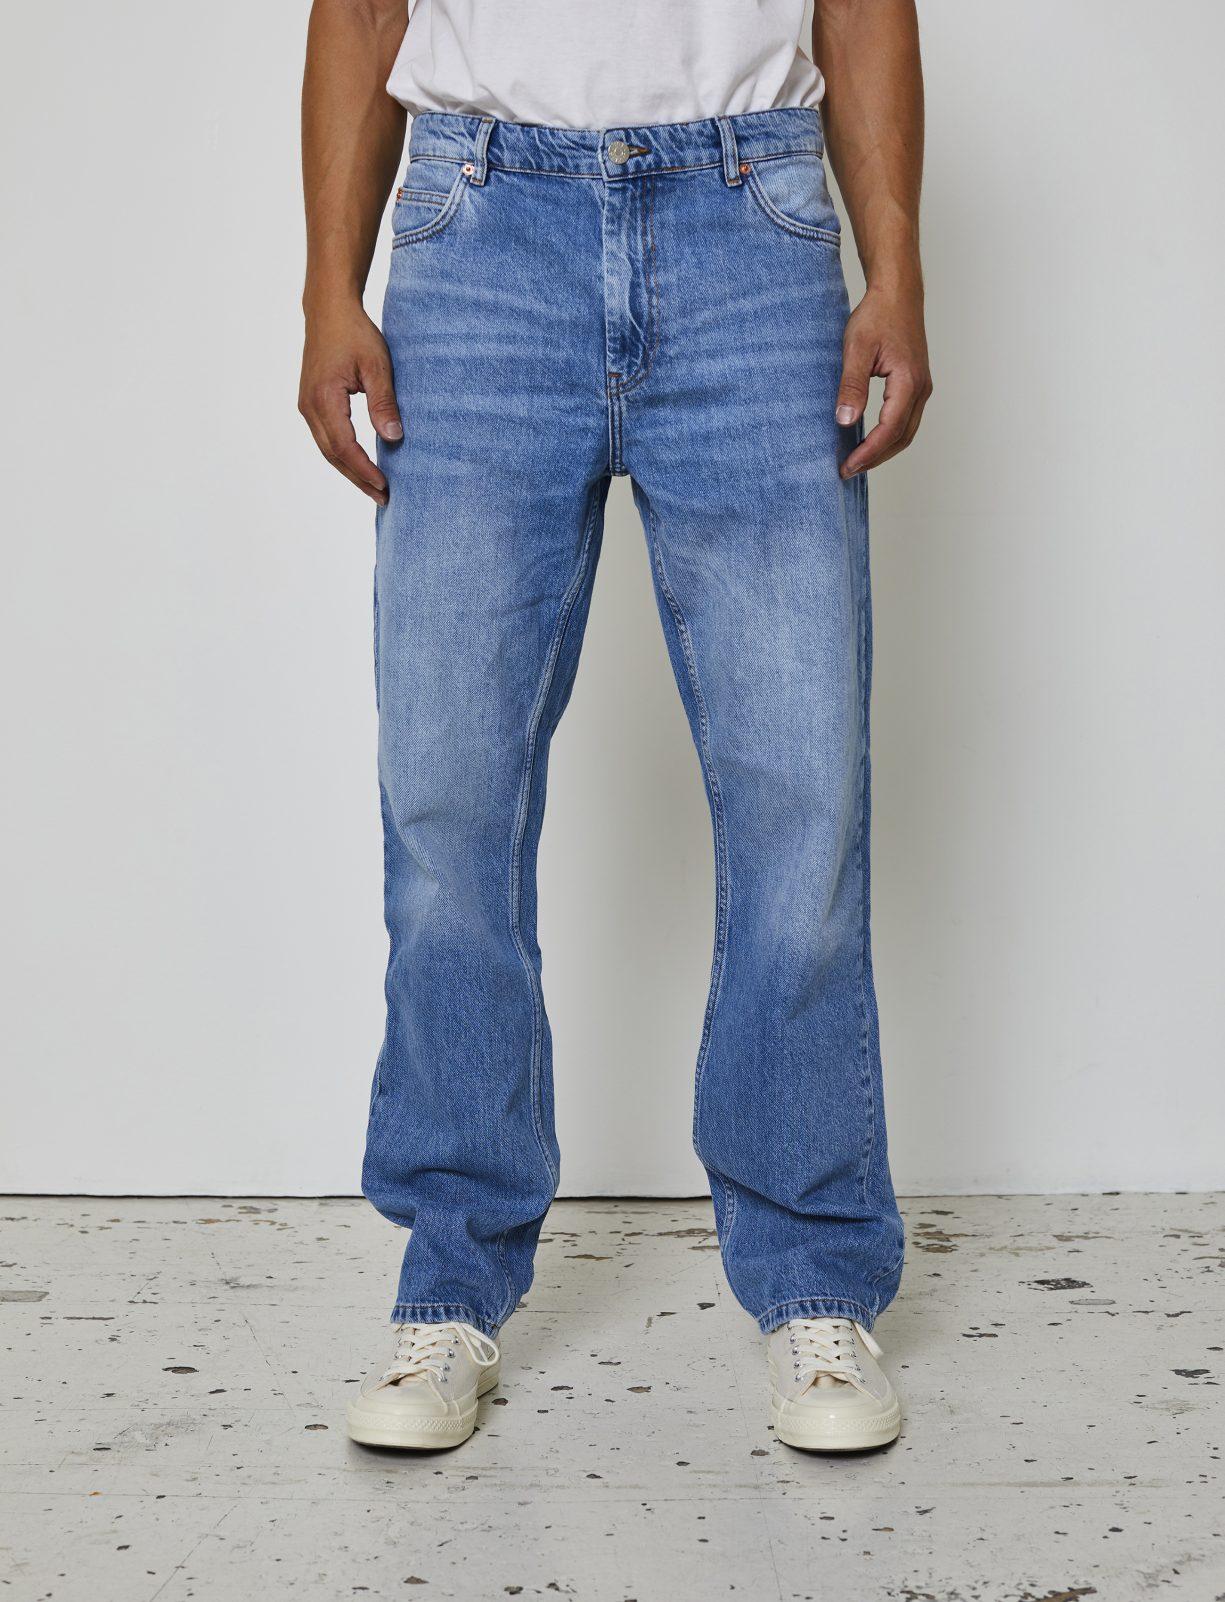 Just junkies Jeans - curtis mondo blue | GATE 36 Hobro